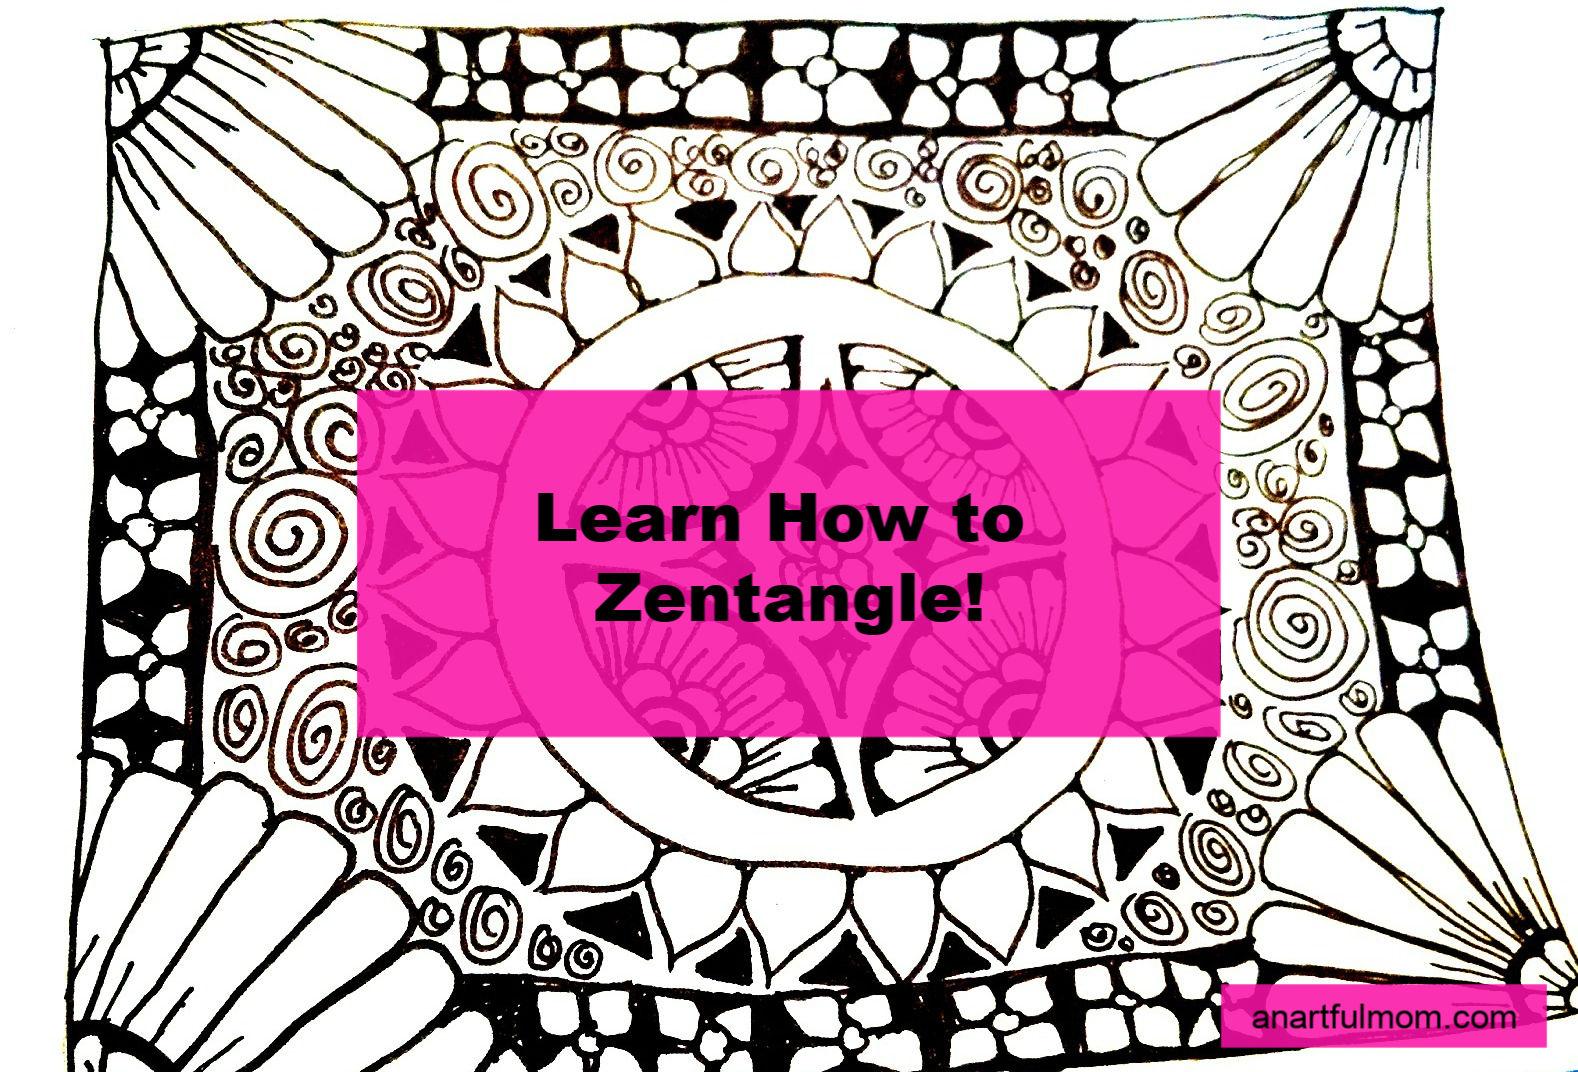 How to Zentangle for Doodlers, bullet journaling, and artists. #zentangle #doodling #bullet journal